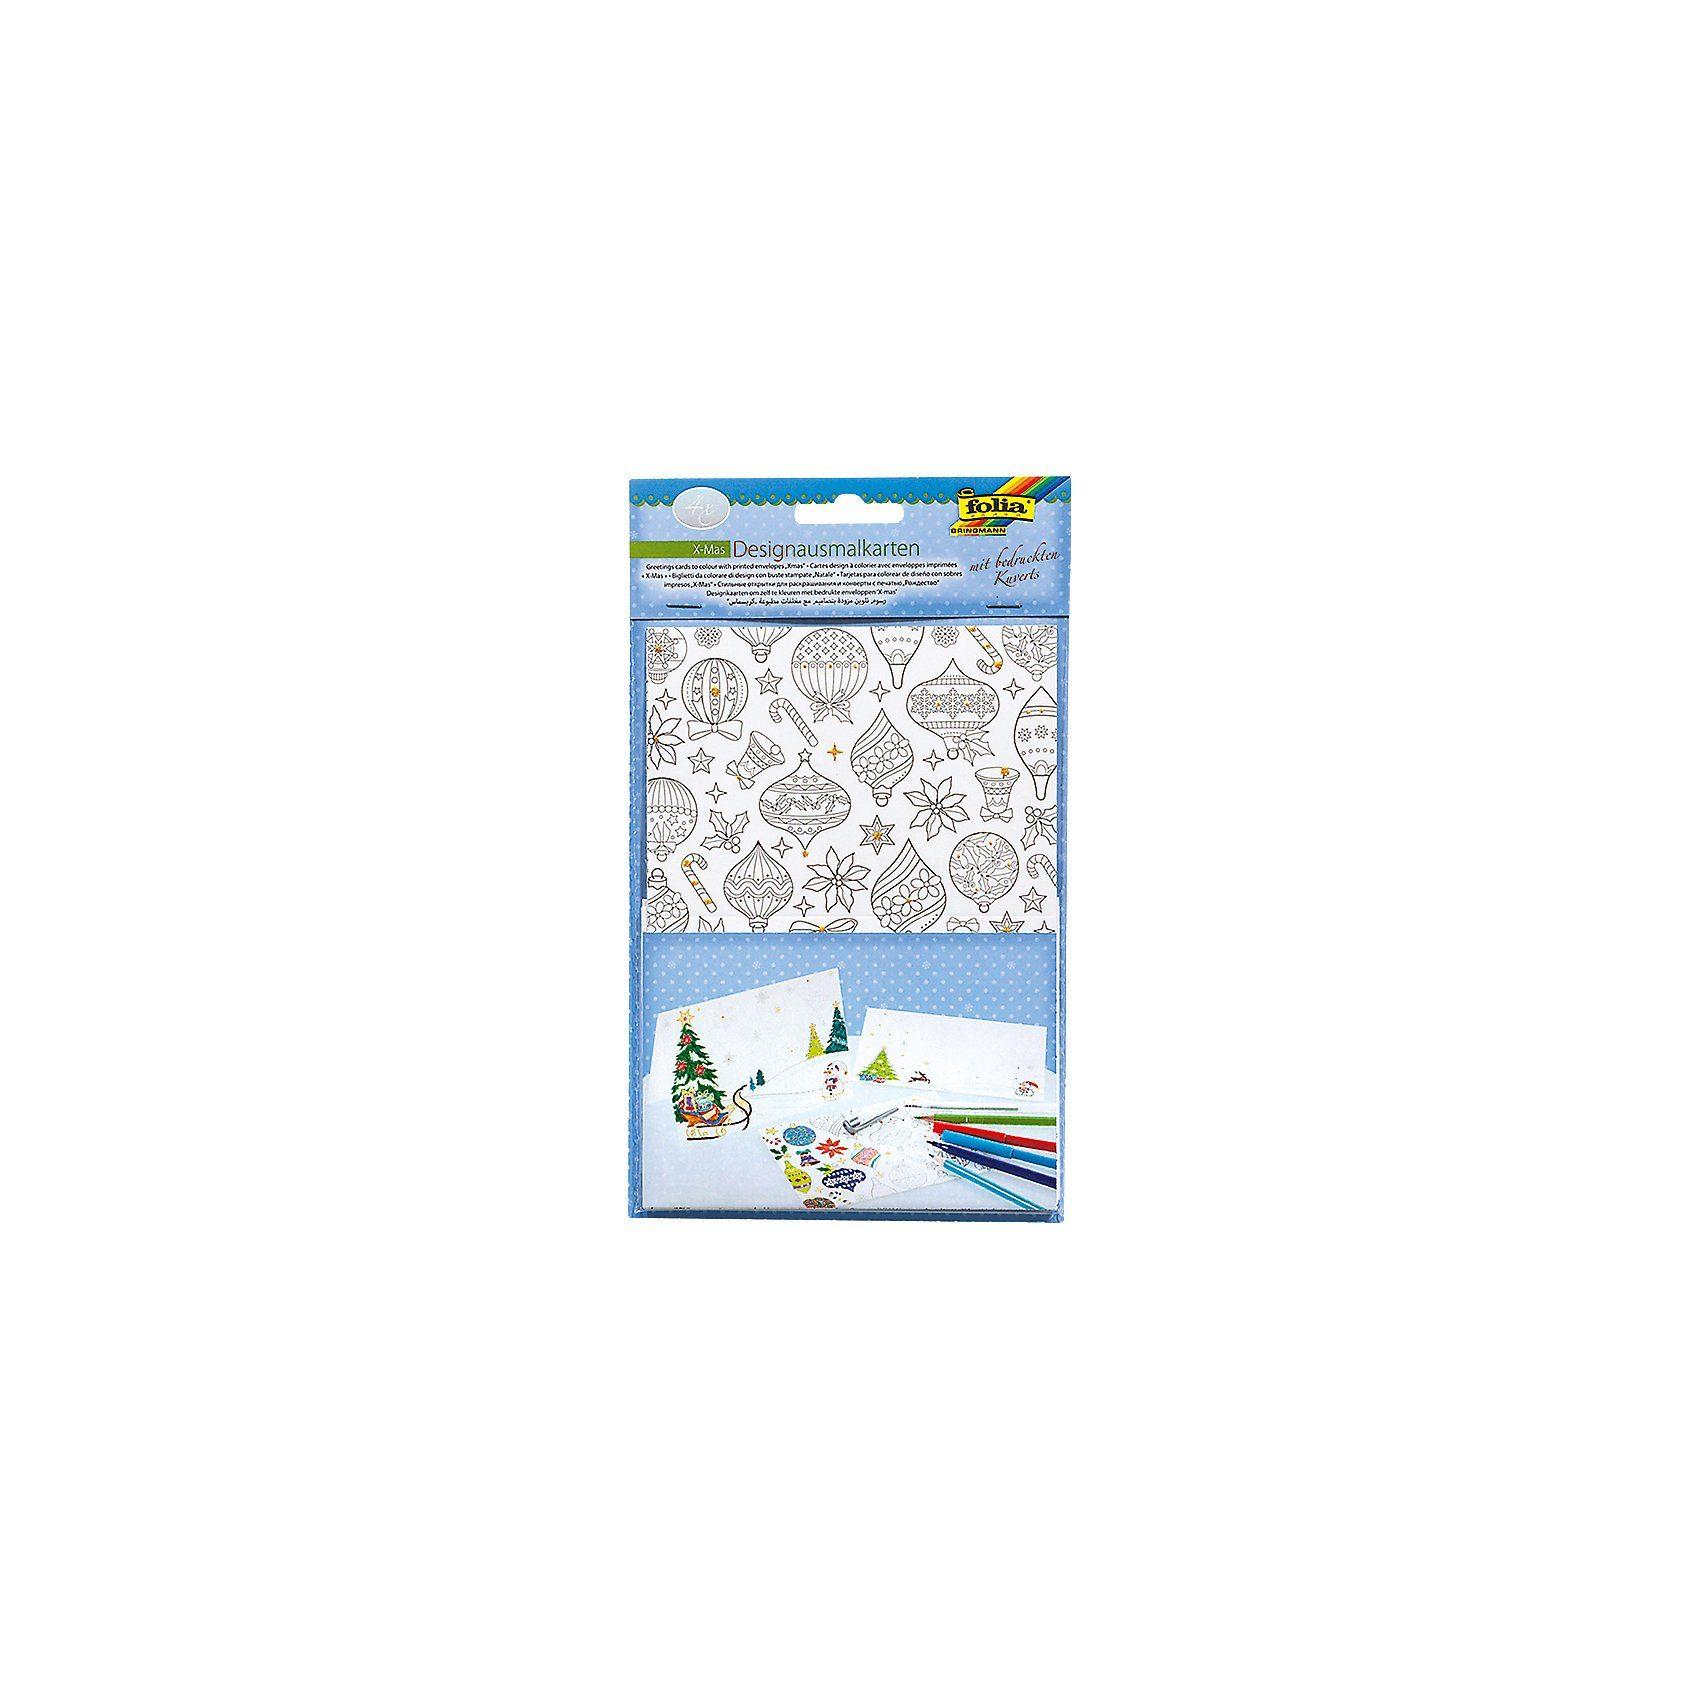 Folia Designausmalkarten 4 Motive mit Kuverts, X-Mas